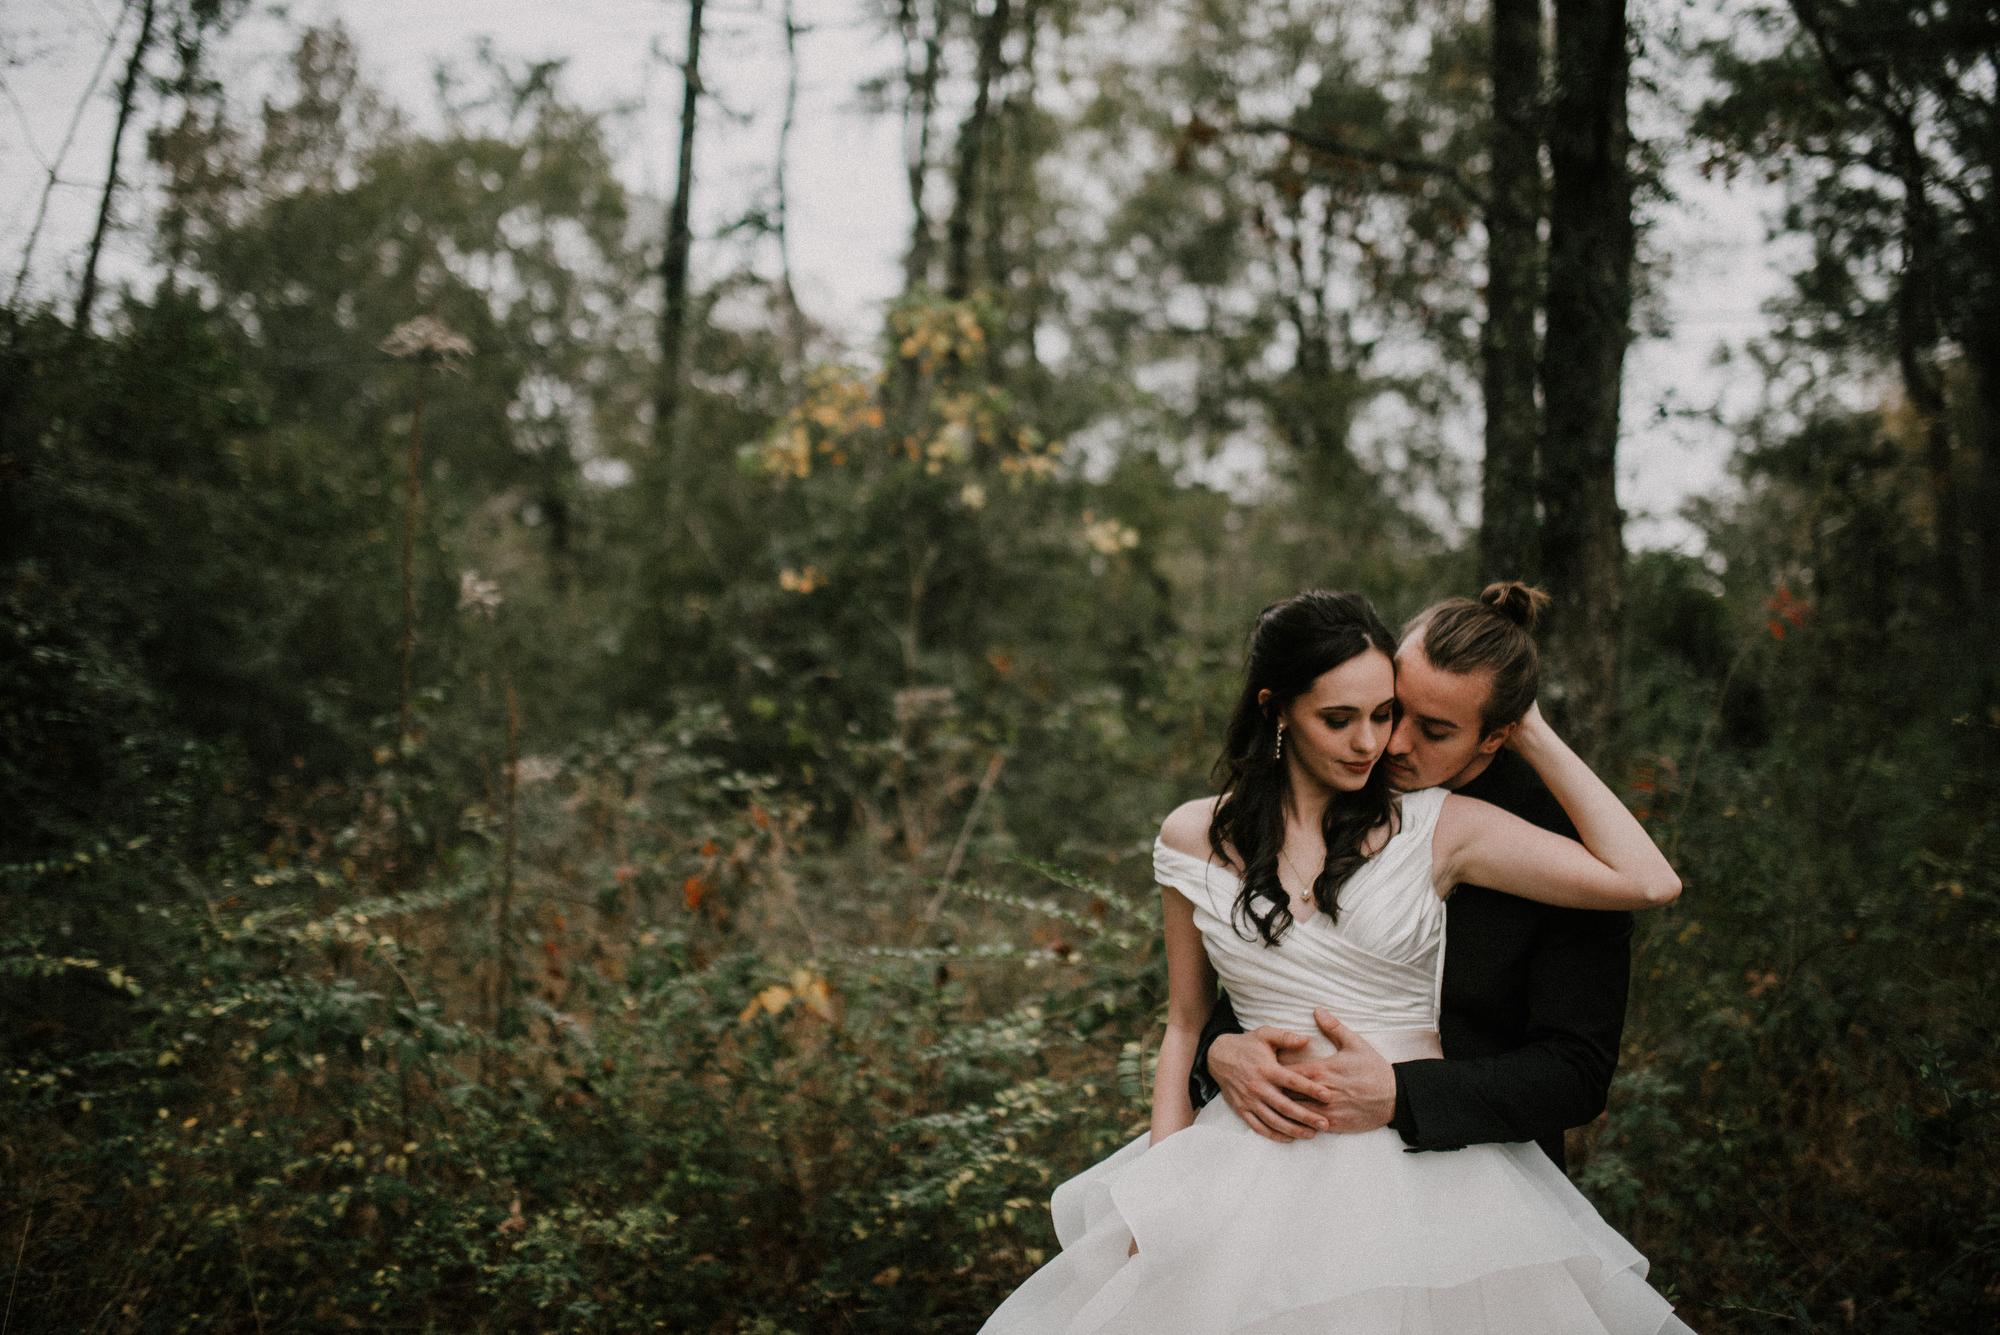 ofRen_weddingPhotos040.JPG